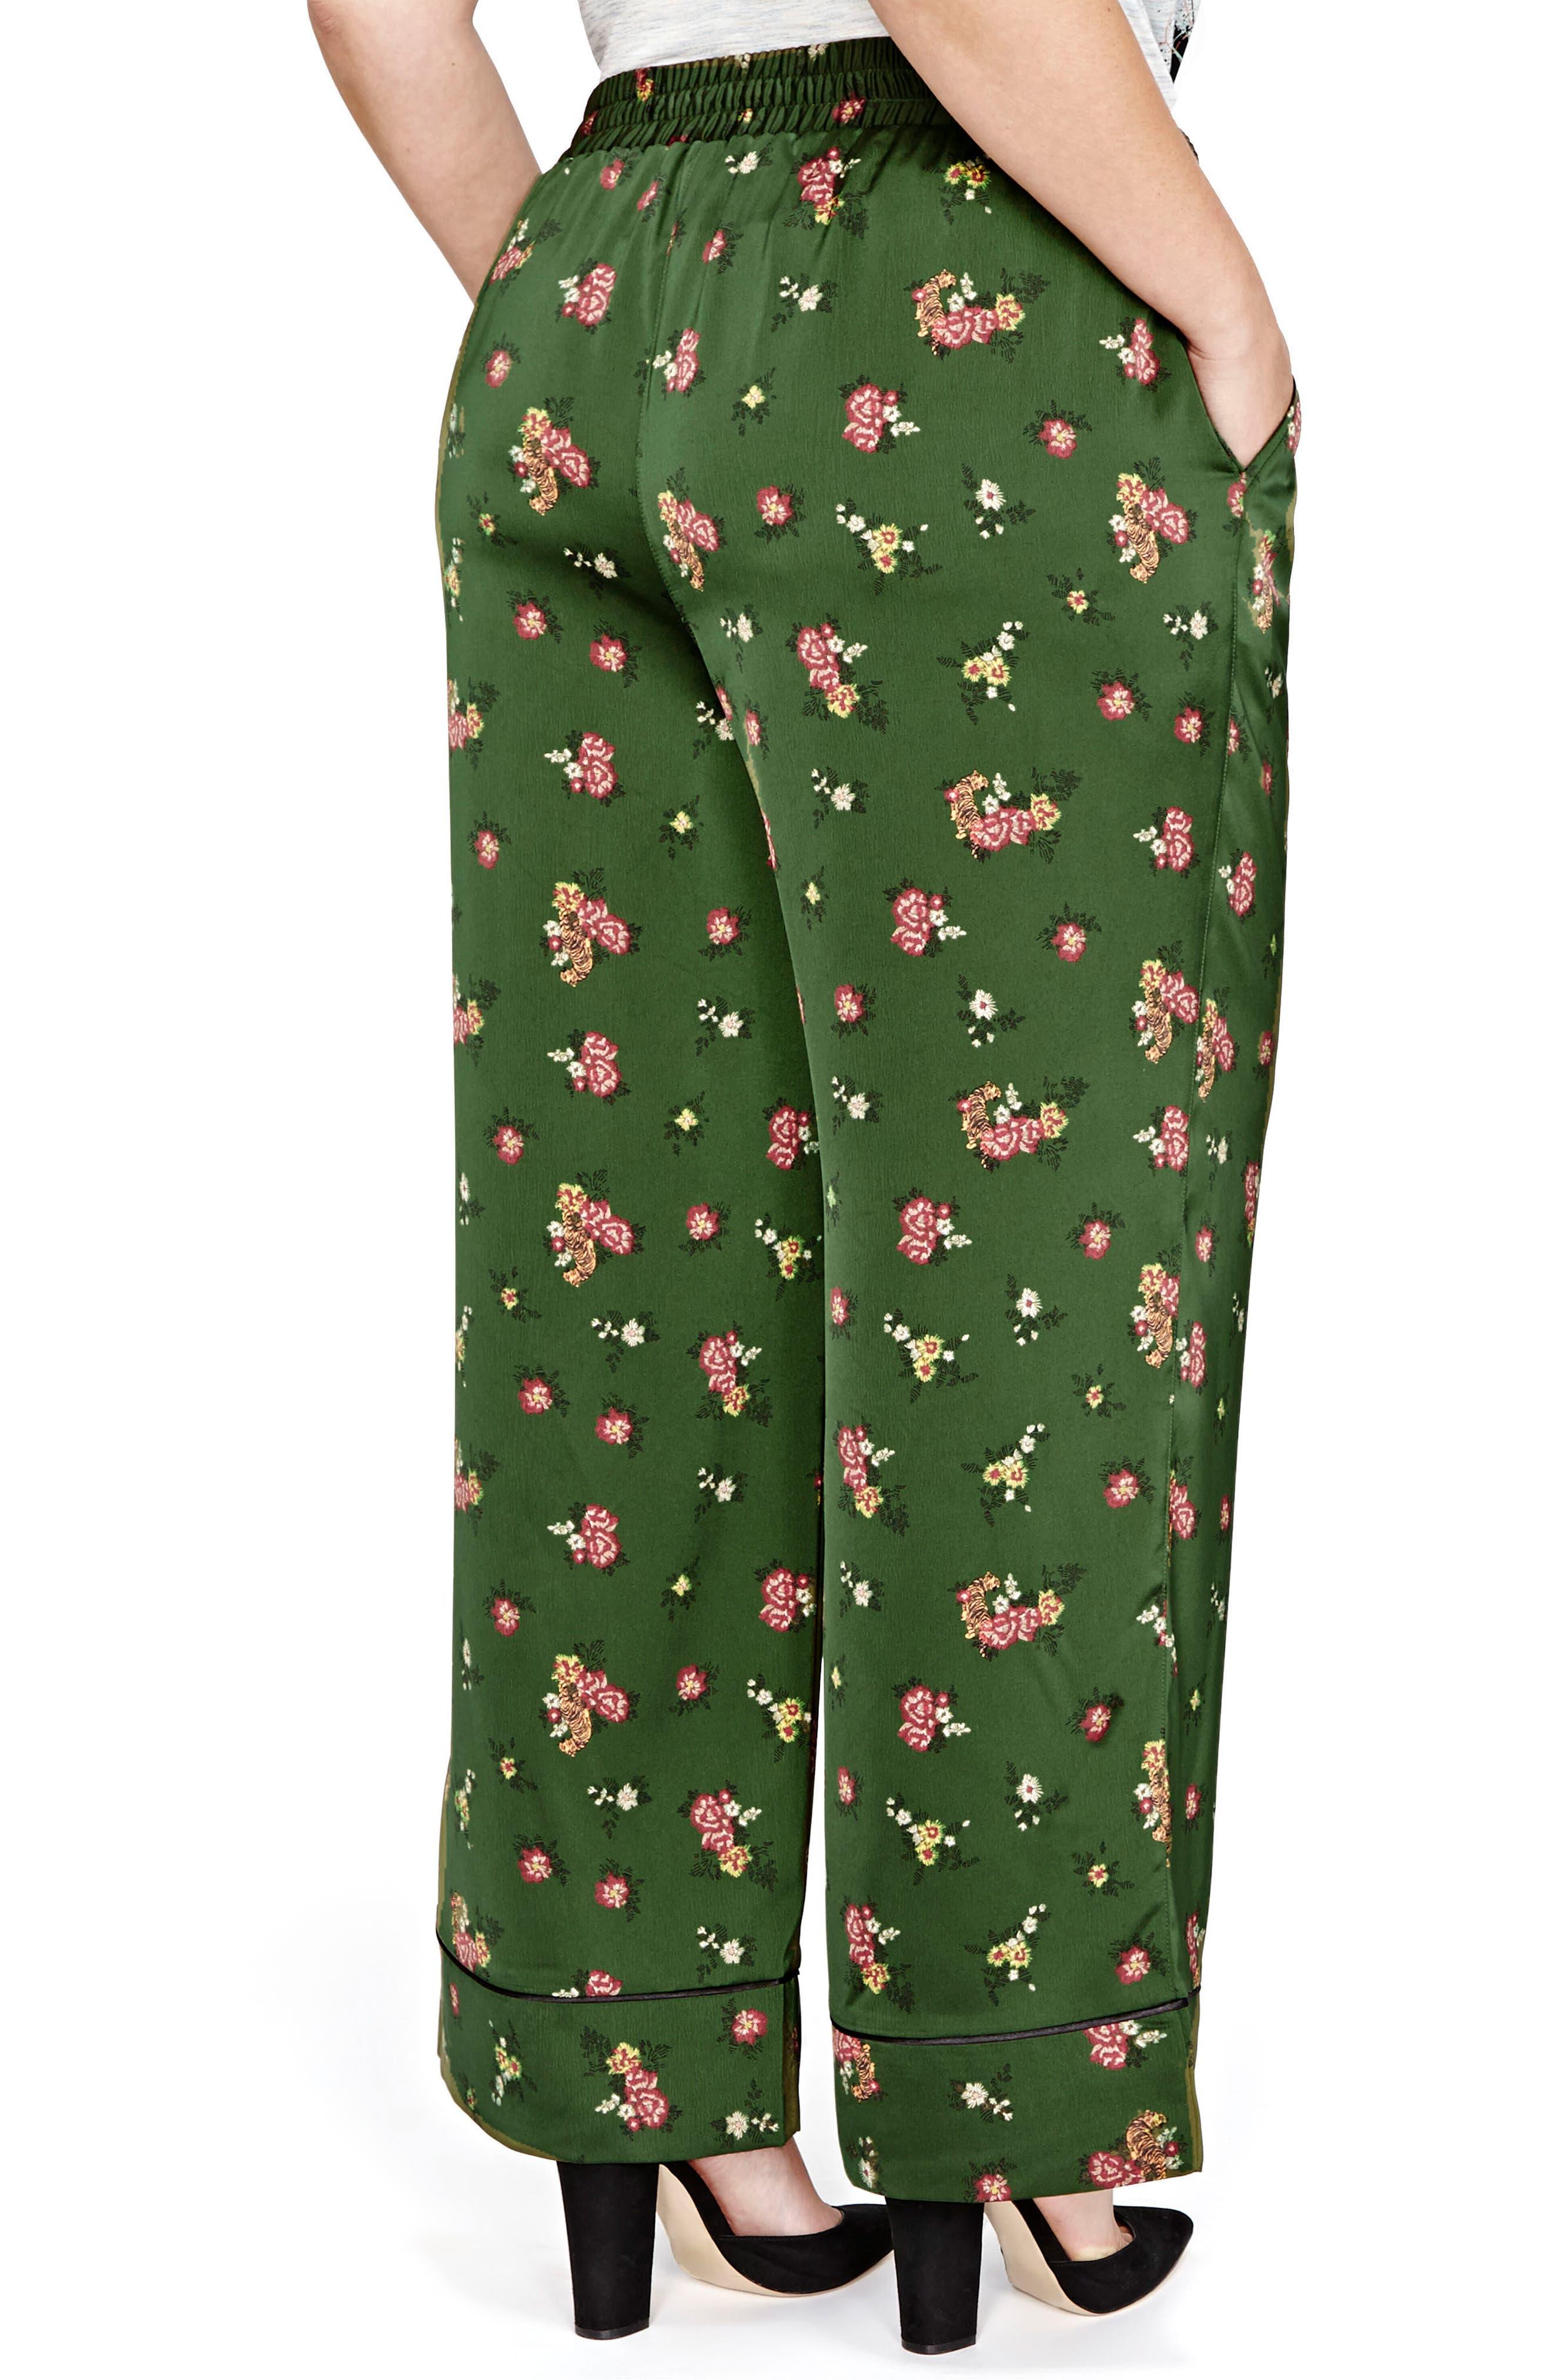 Jordyn Woods Wide-Leg Satin Pants,                             Alternate thumbnail 3, color,                             Deep Khaki Floral Aop